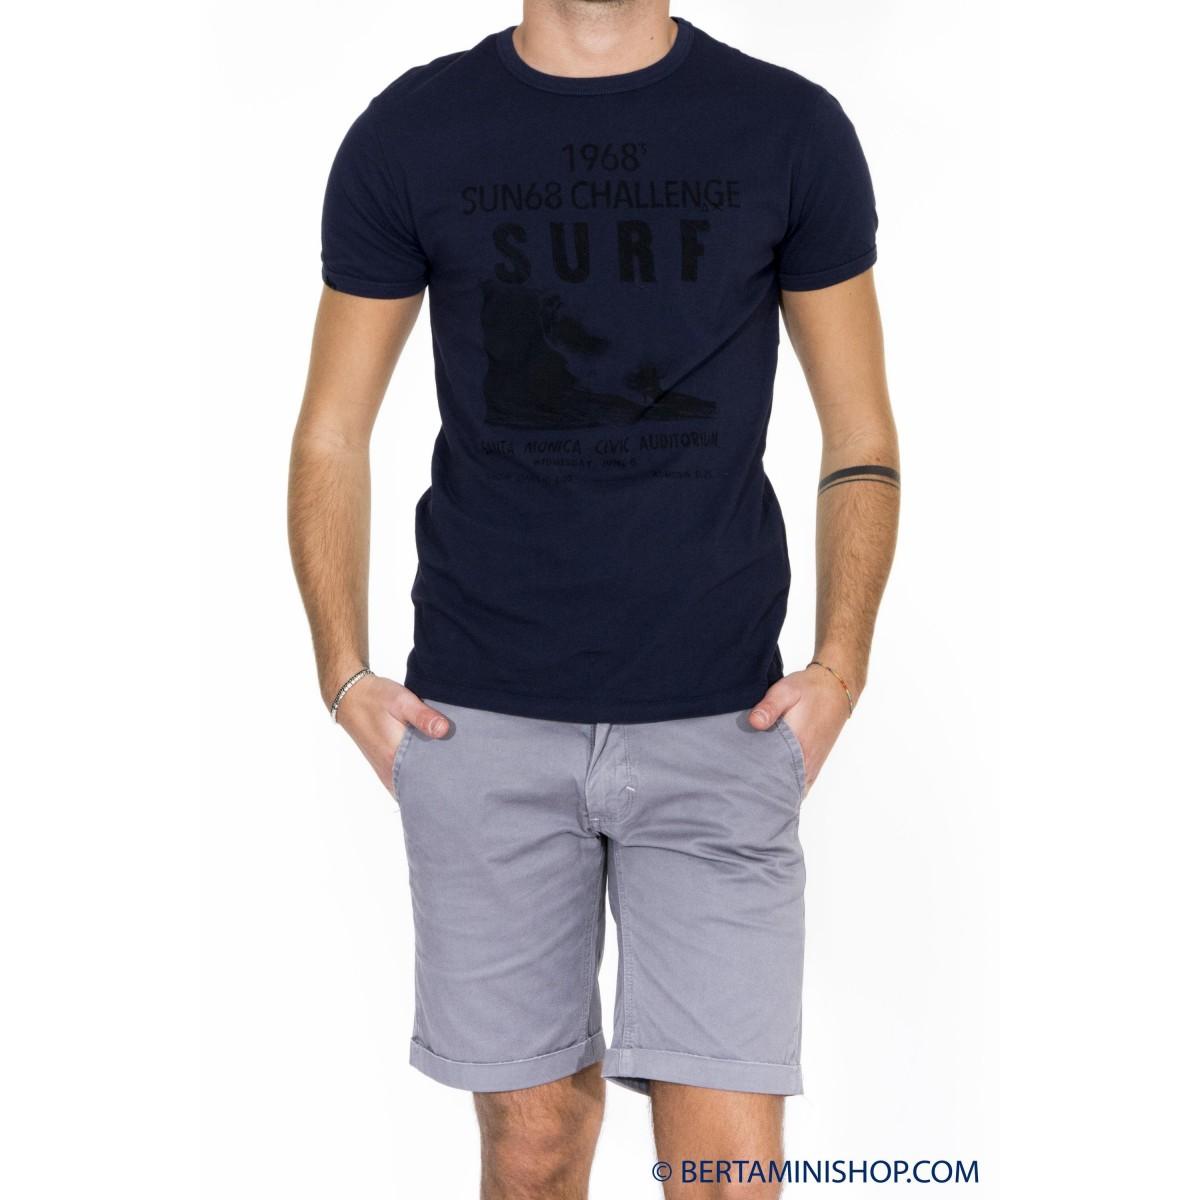 T-shirt uomo Sun 68 - 16125 t-shirt stampa